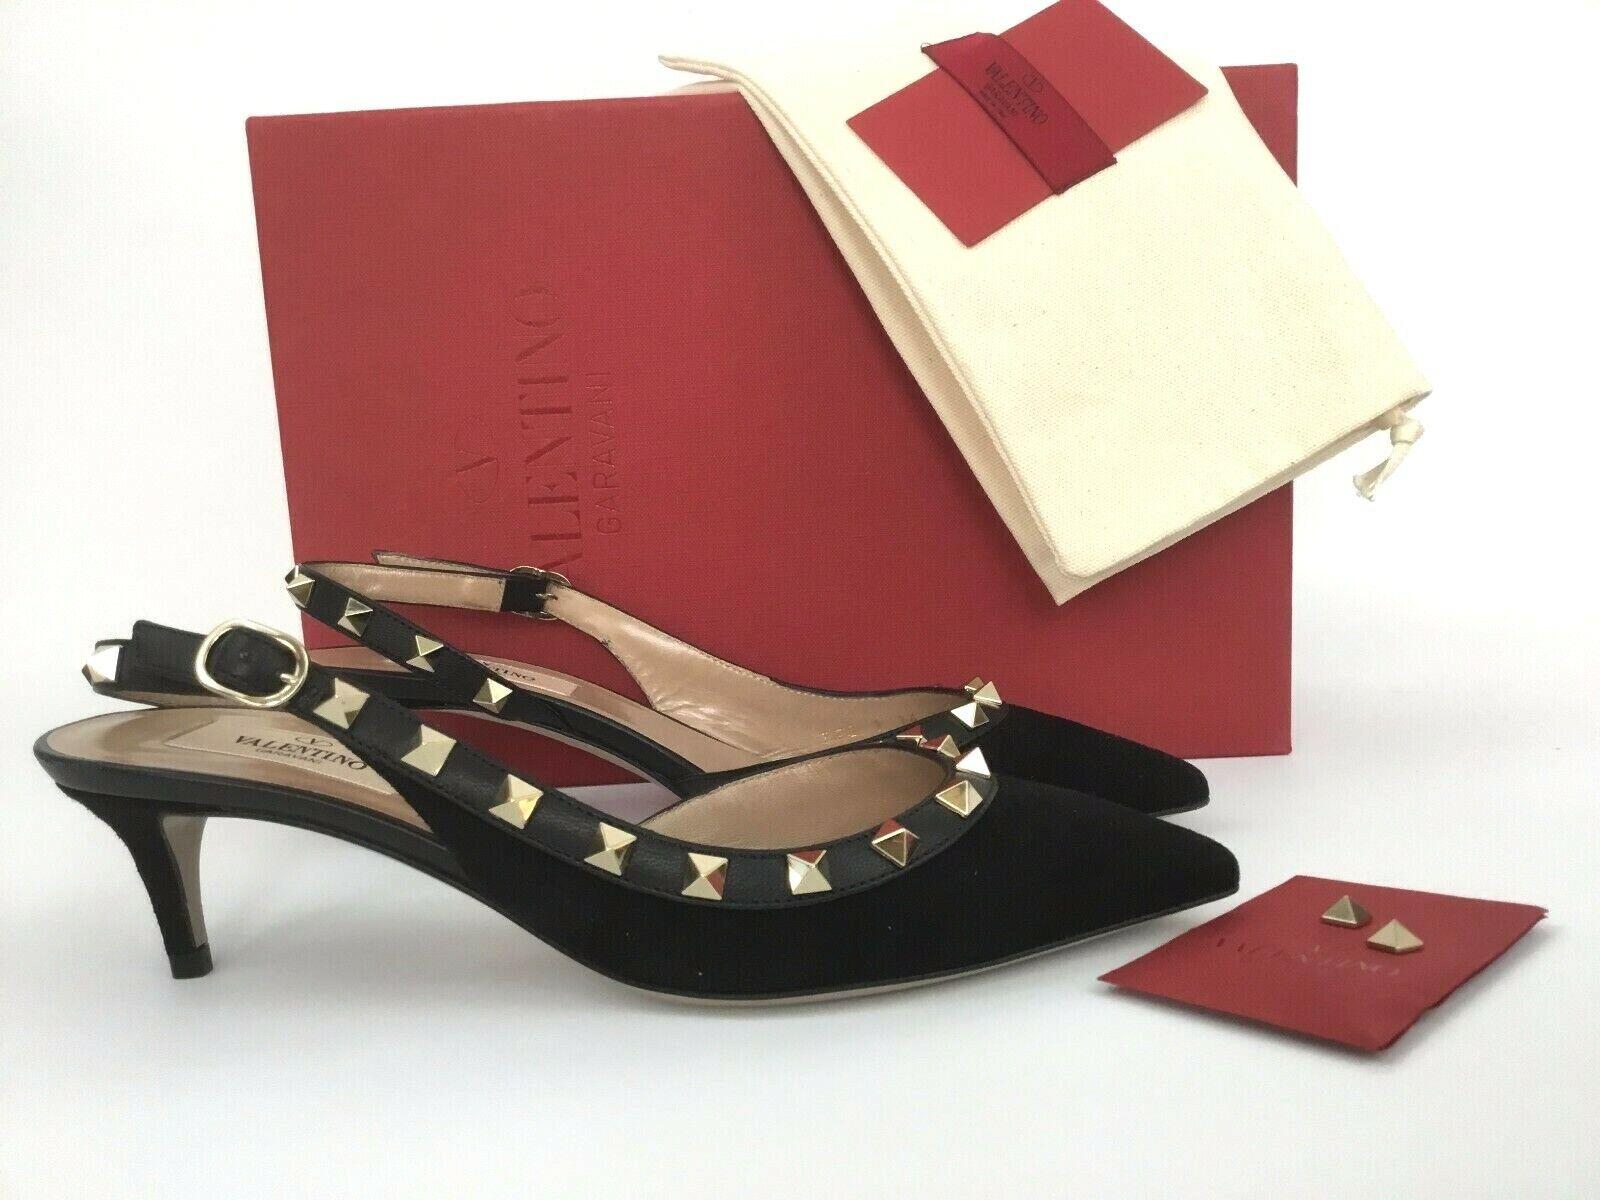 40 VALENTINO GARAVANI Rockstud Black Suede Slingback Pumps Heels Shoes Sandals